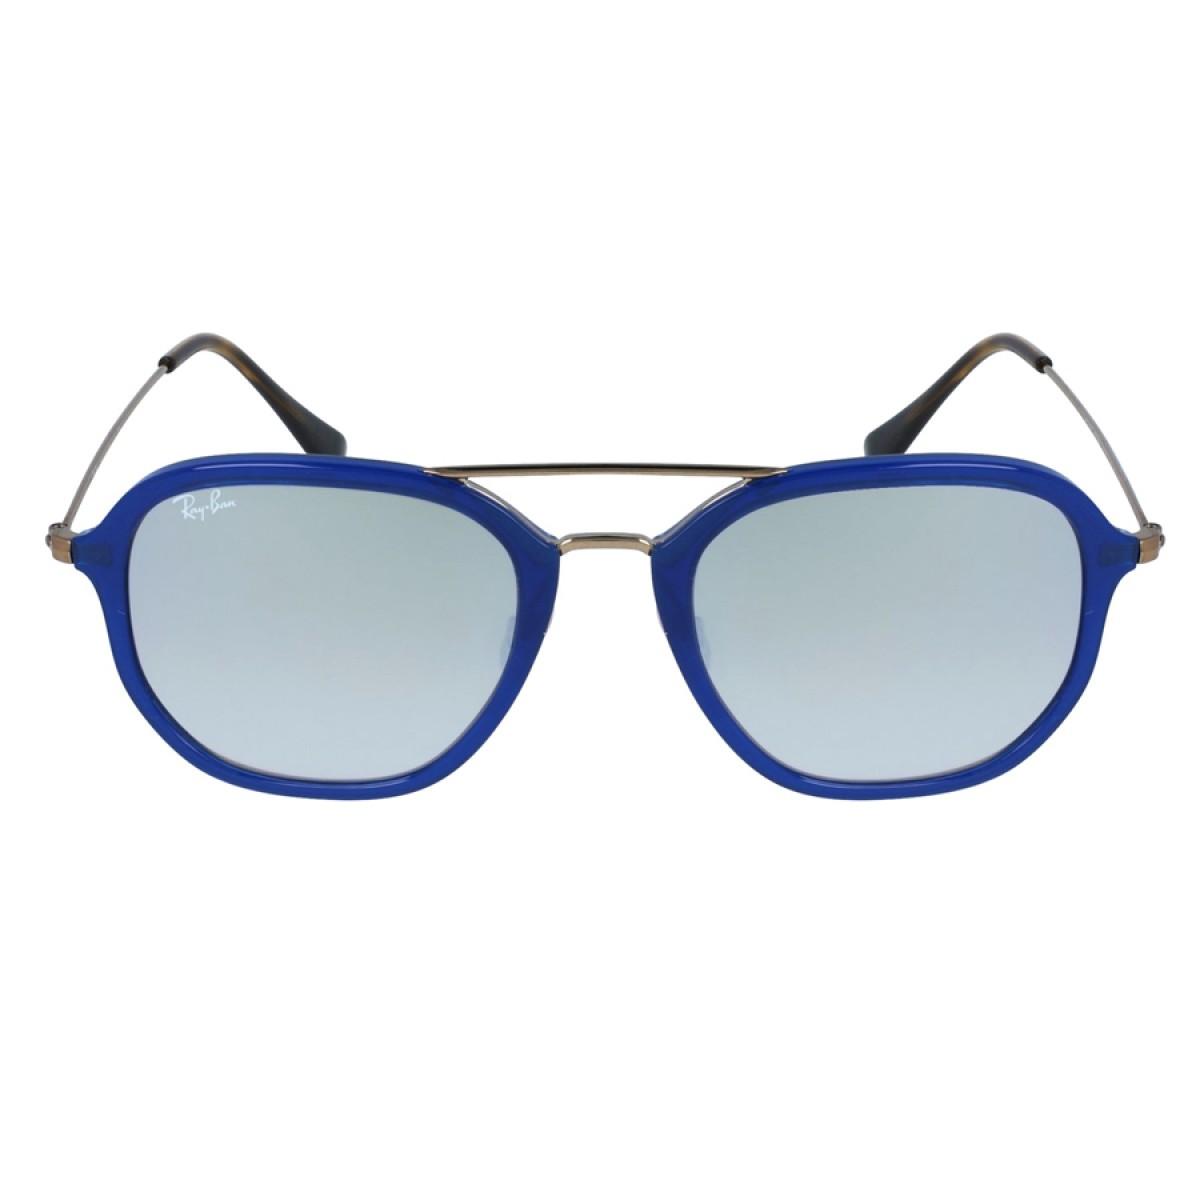 3b4e79dc6a861 Ray Ban Highstreet Gradient Silver Flash Square Unisex Sunglasses  RB4273-62599U - Sunglasses - Fashion World